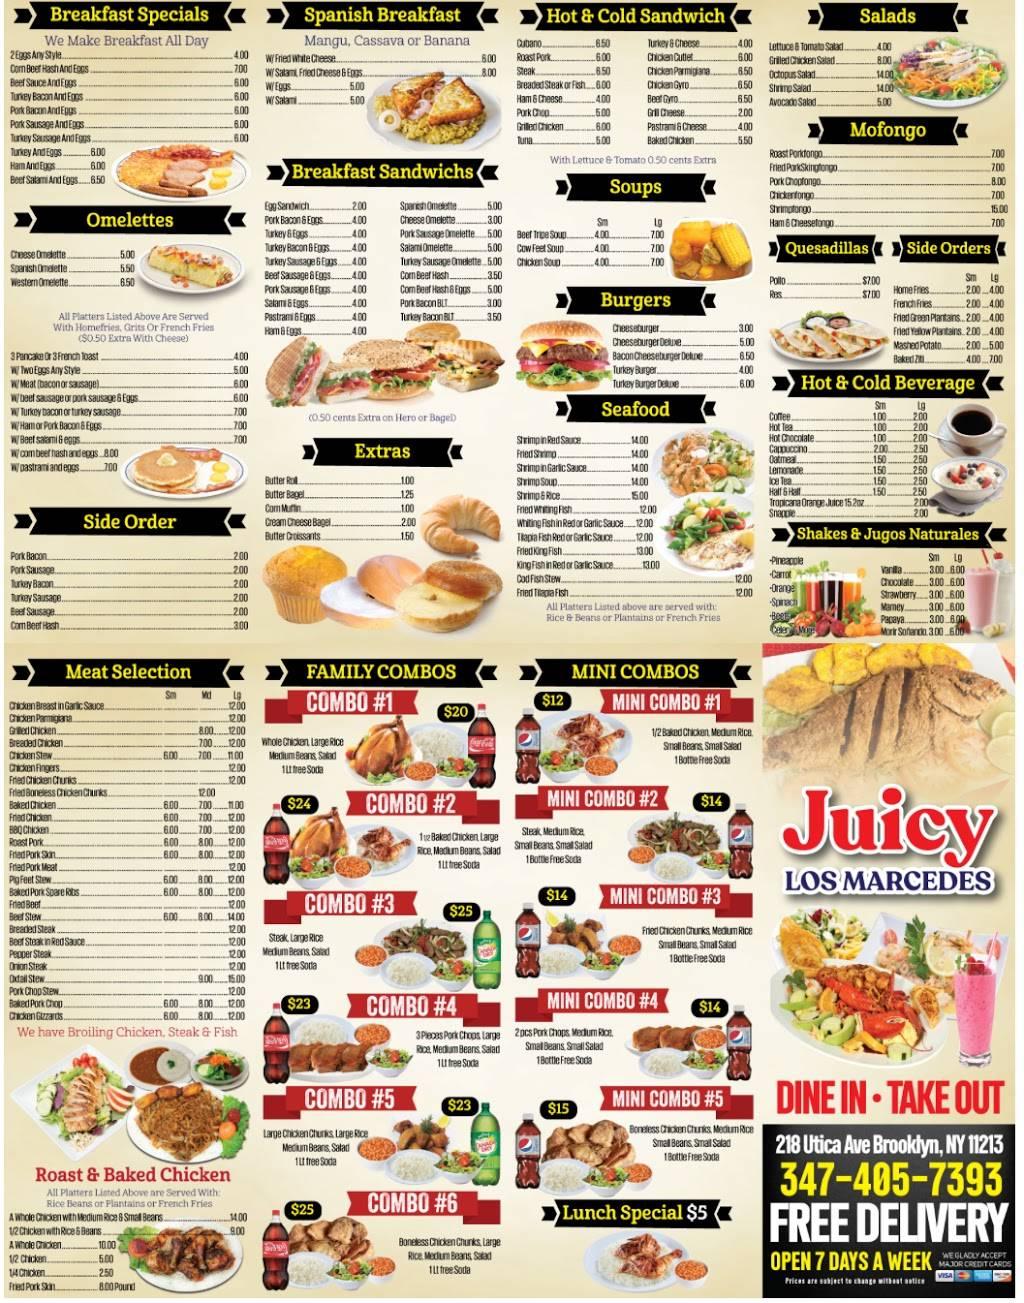 Juicy Los Mercedes | restaurant | 218 Utica Ave, Brooklyn, NY 11213, USA | 3474057393 OR +1 347-405-7393